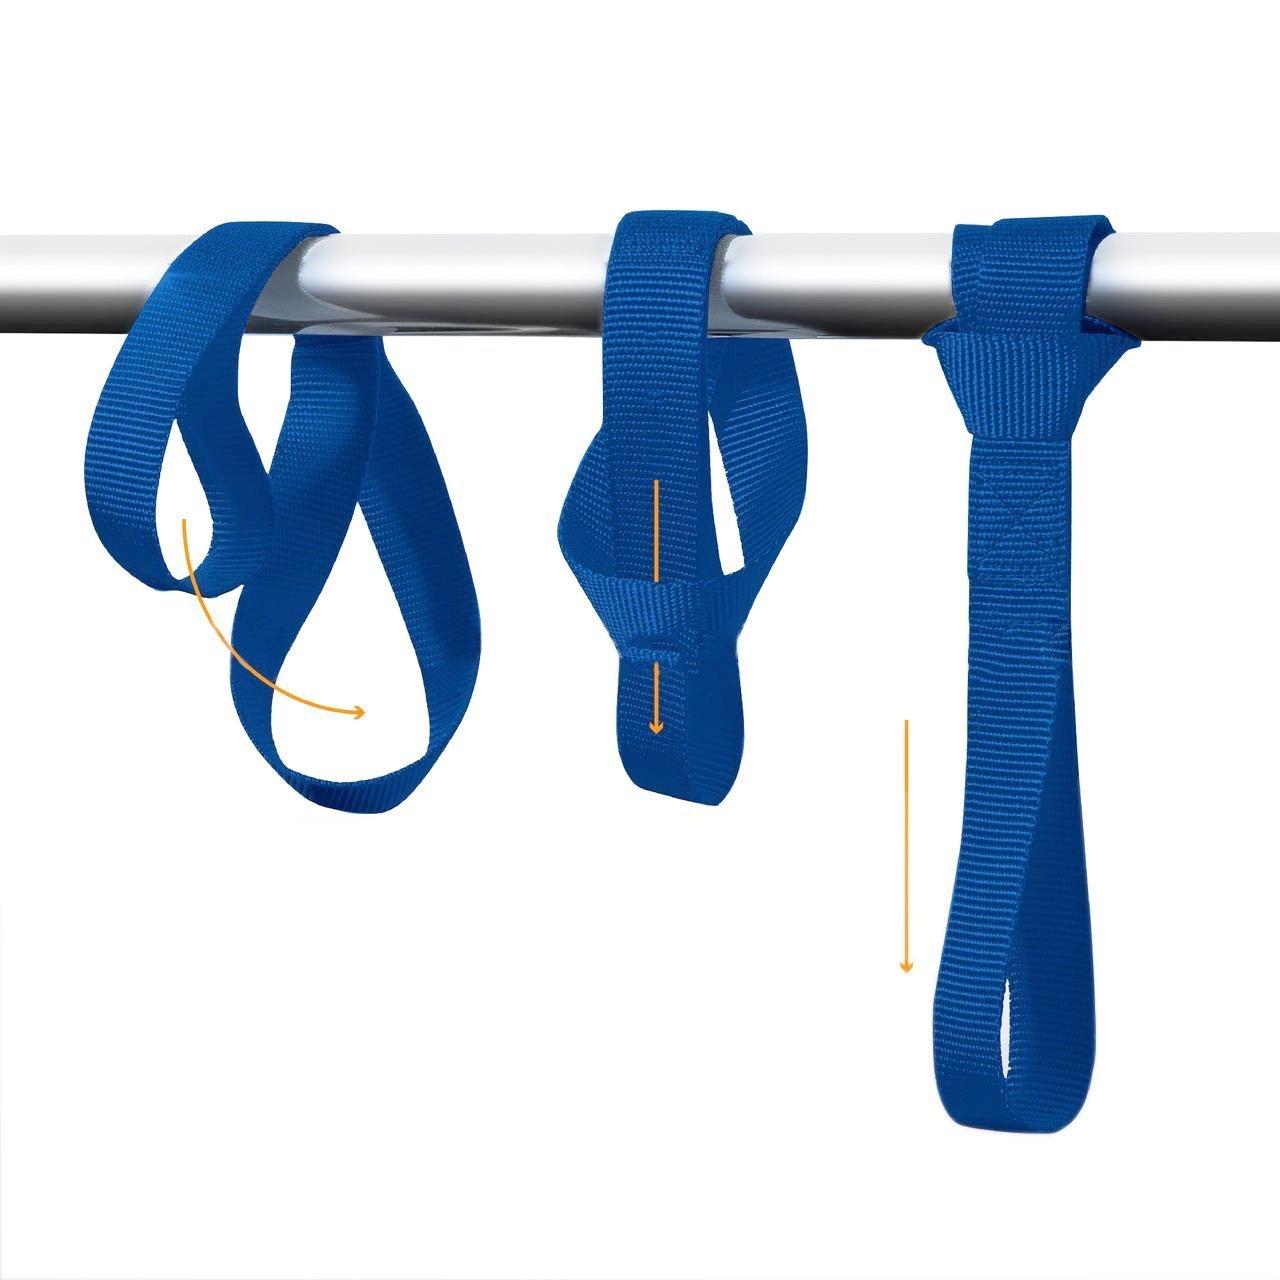 "PERTTY 6 Pack Soft Loops Tie Down Straps Heavy Duty Soft Loops Tie Down Extension Straps for ATV UTV Motorcycle Dirt Bike Blue 1/""x12/"" T/&HI-B07C7G641Q"